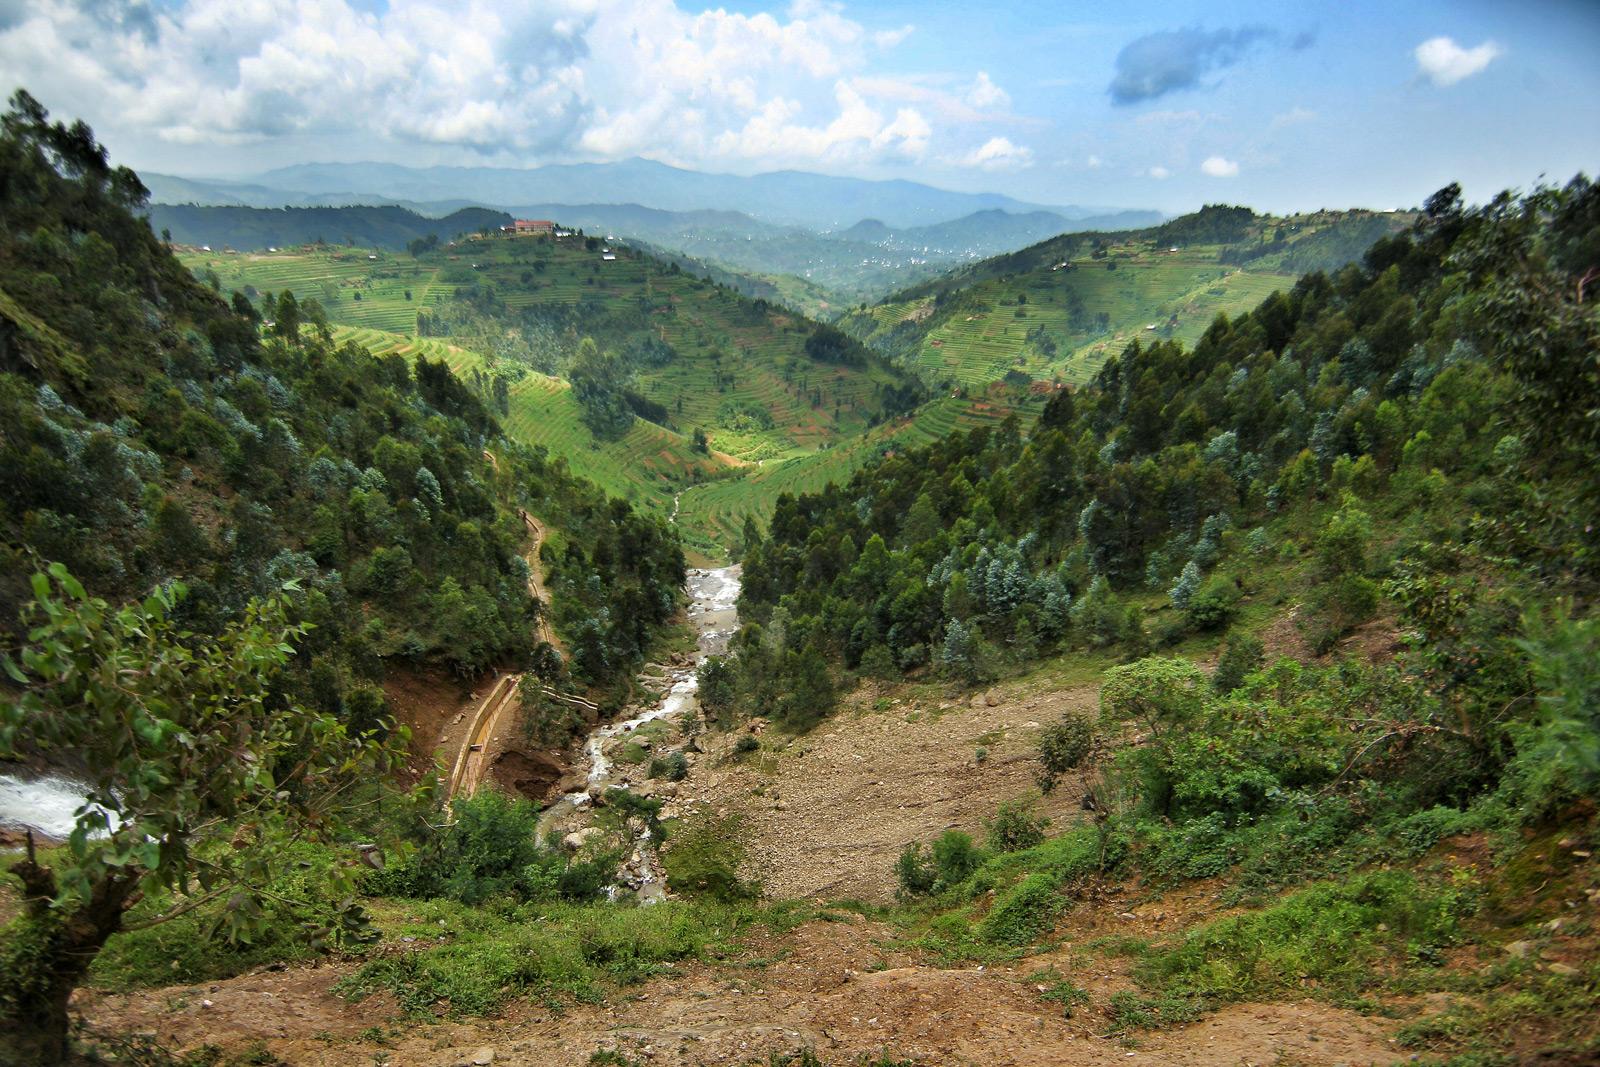 A glimpse at the incredible Rwandan countryside ©Jytte Fredholm Ferreira